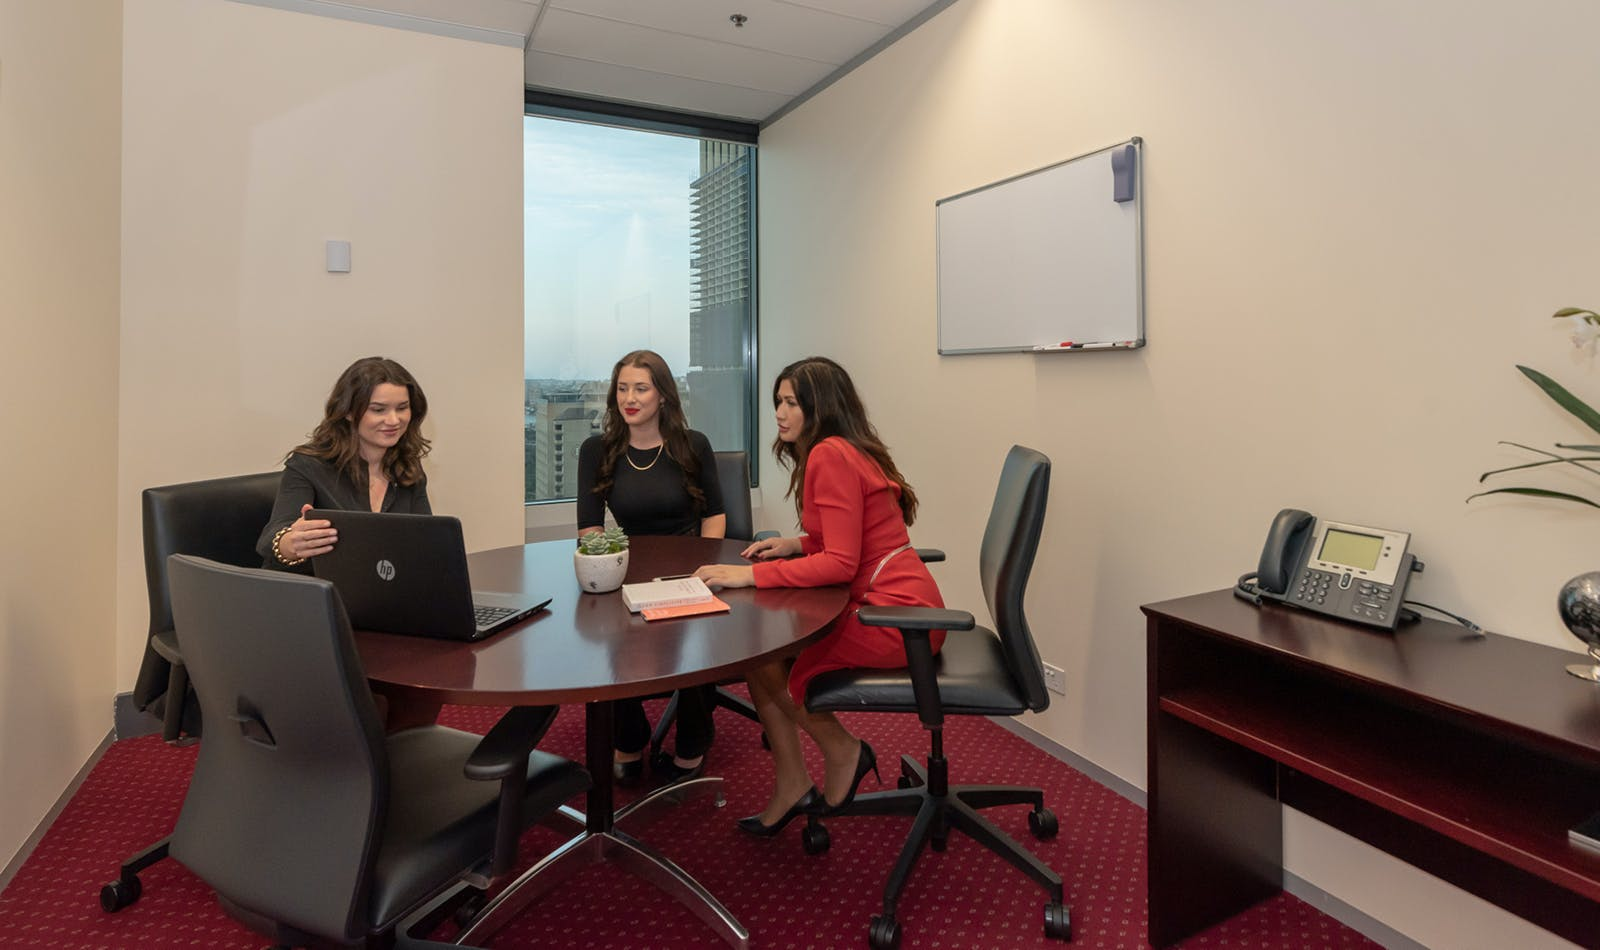 Coworking hot desk, hot desk at AMP Tower, image 6